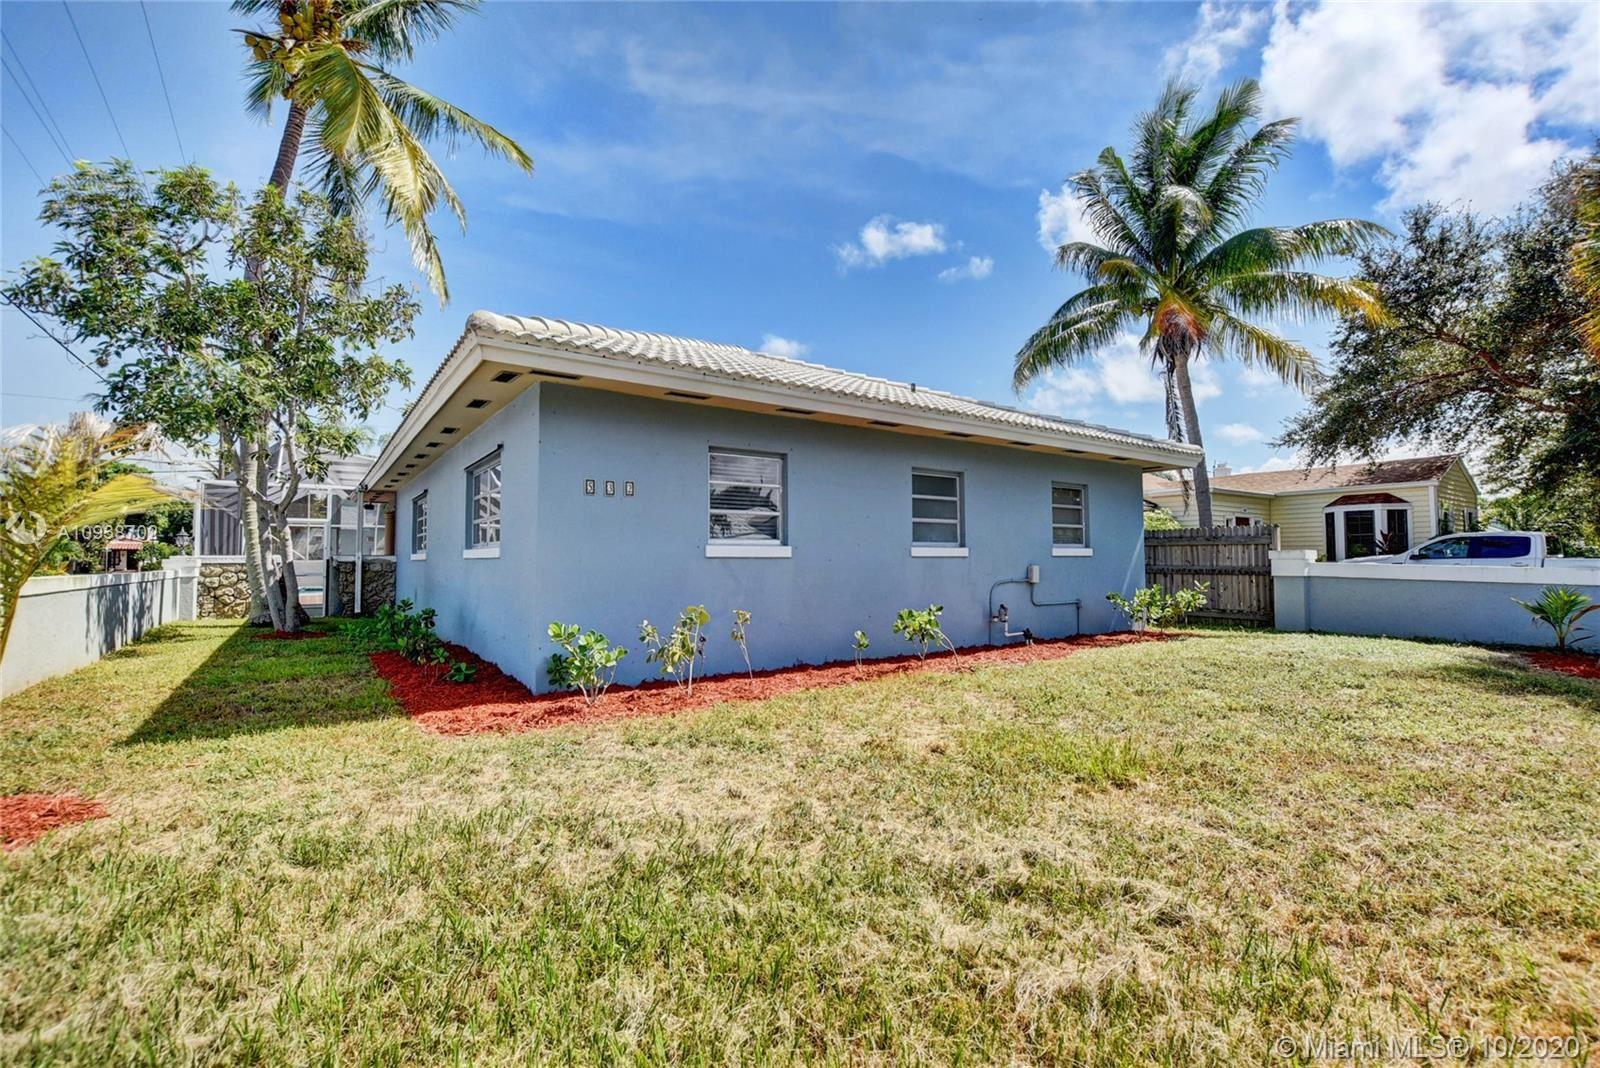 532 N Palmway, Lake Worth, FL 33460 - #: A10938702